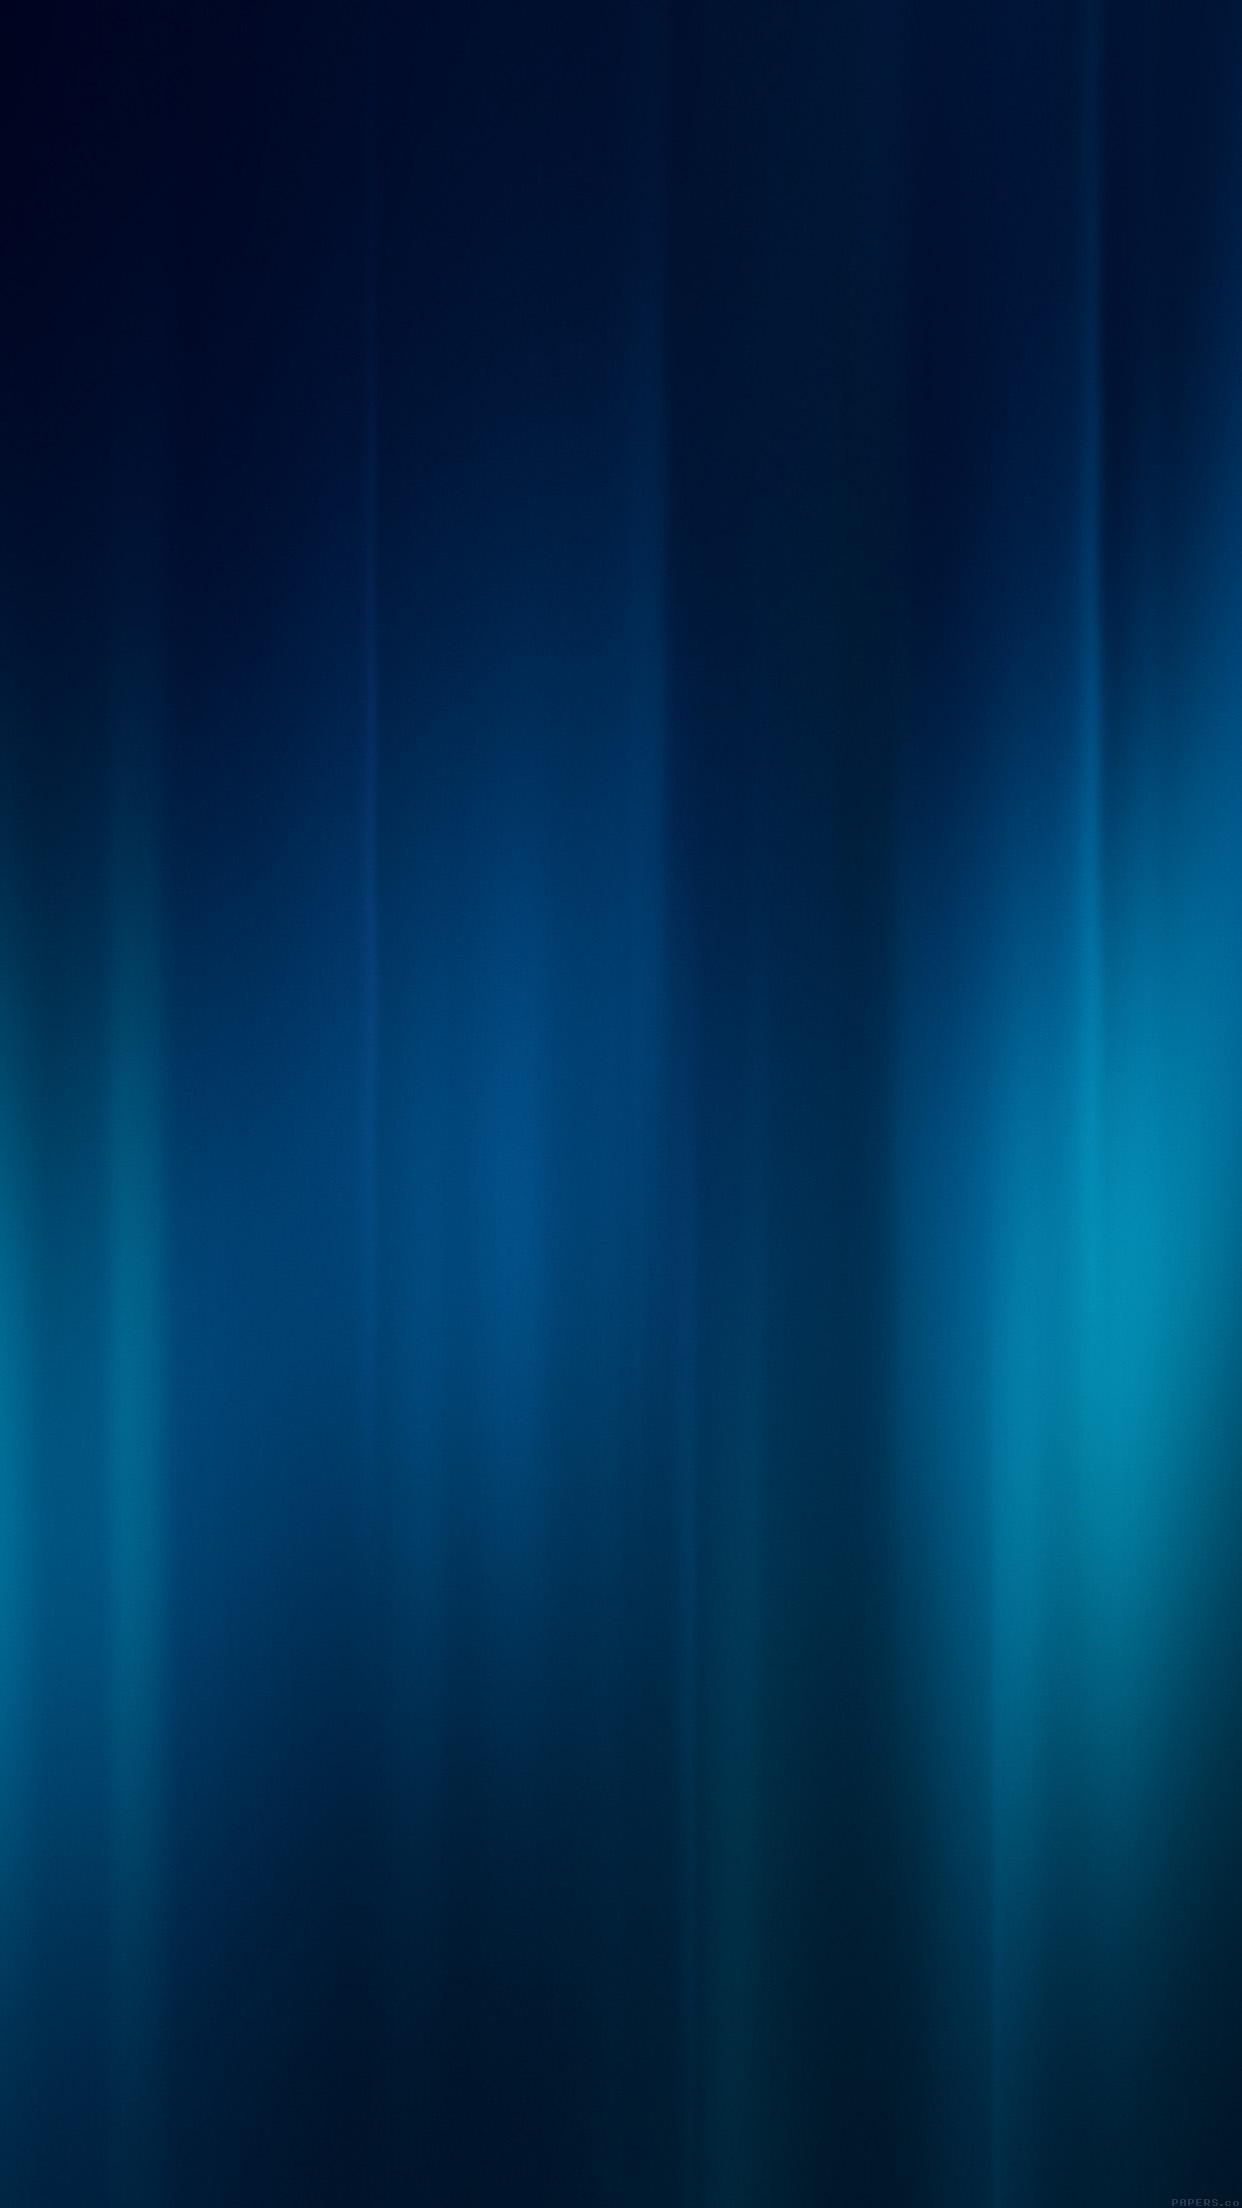 Simple Wallpaper Cute Vi17 Retro Moden Blue Abstract Pattern Wallpaper